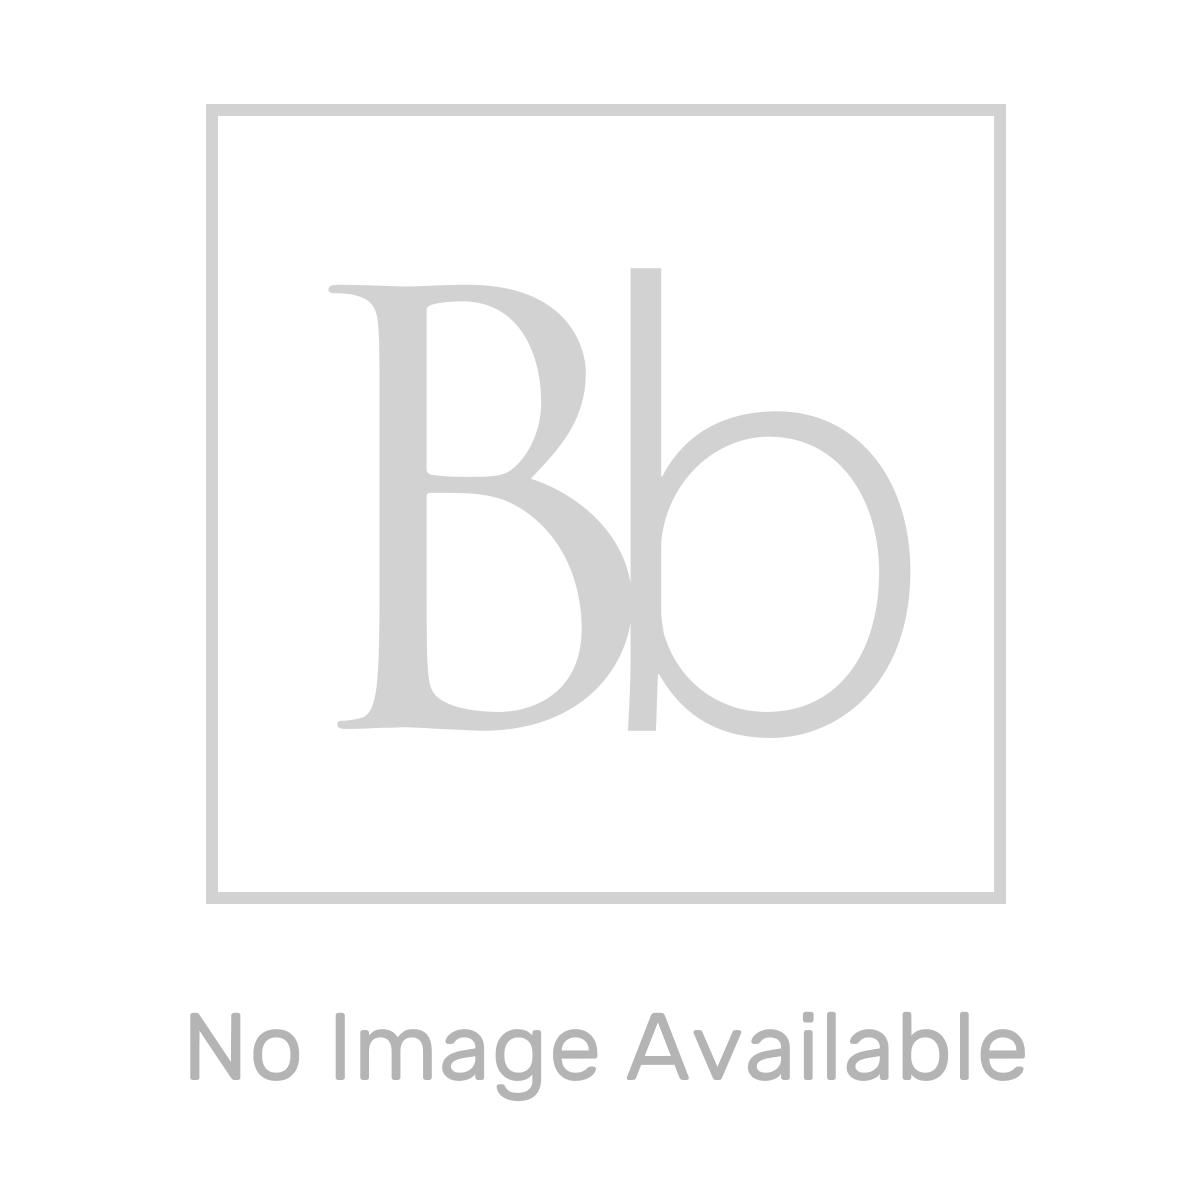 Frontline Aquaglass+ Sphere Black Tinted Quadrant Shower Enclosure Dimensions